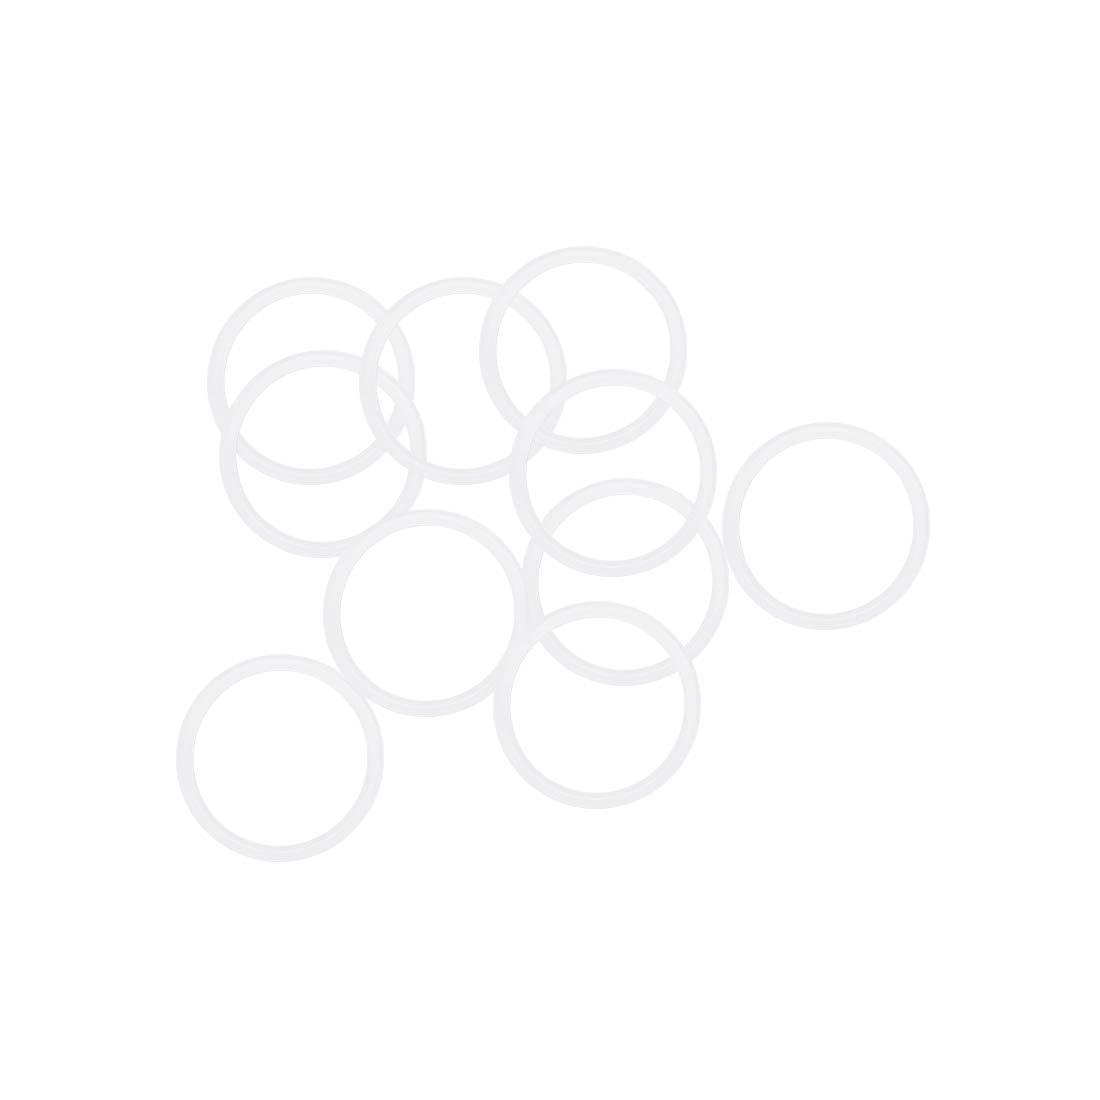 sourcing map 10stk 1,5mm Breite Dichtung Wei/ß 16mm Innendurchm Silikon O-Ringe 19mm Au/ßendurchm